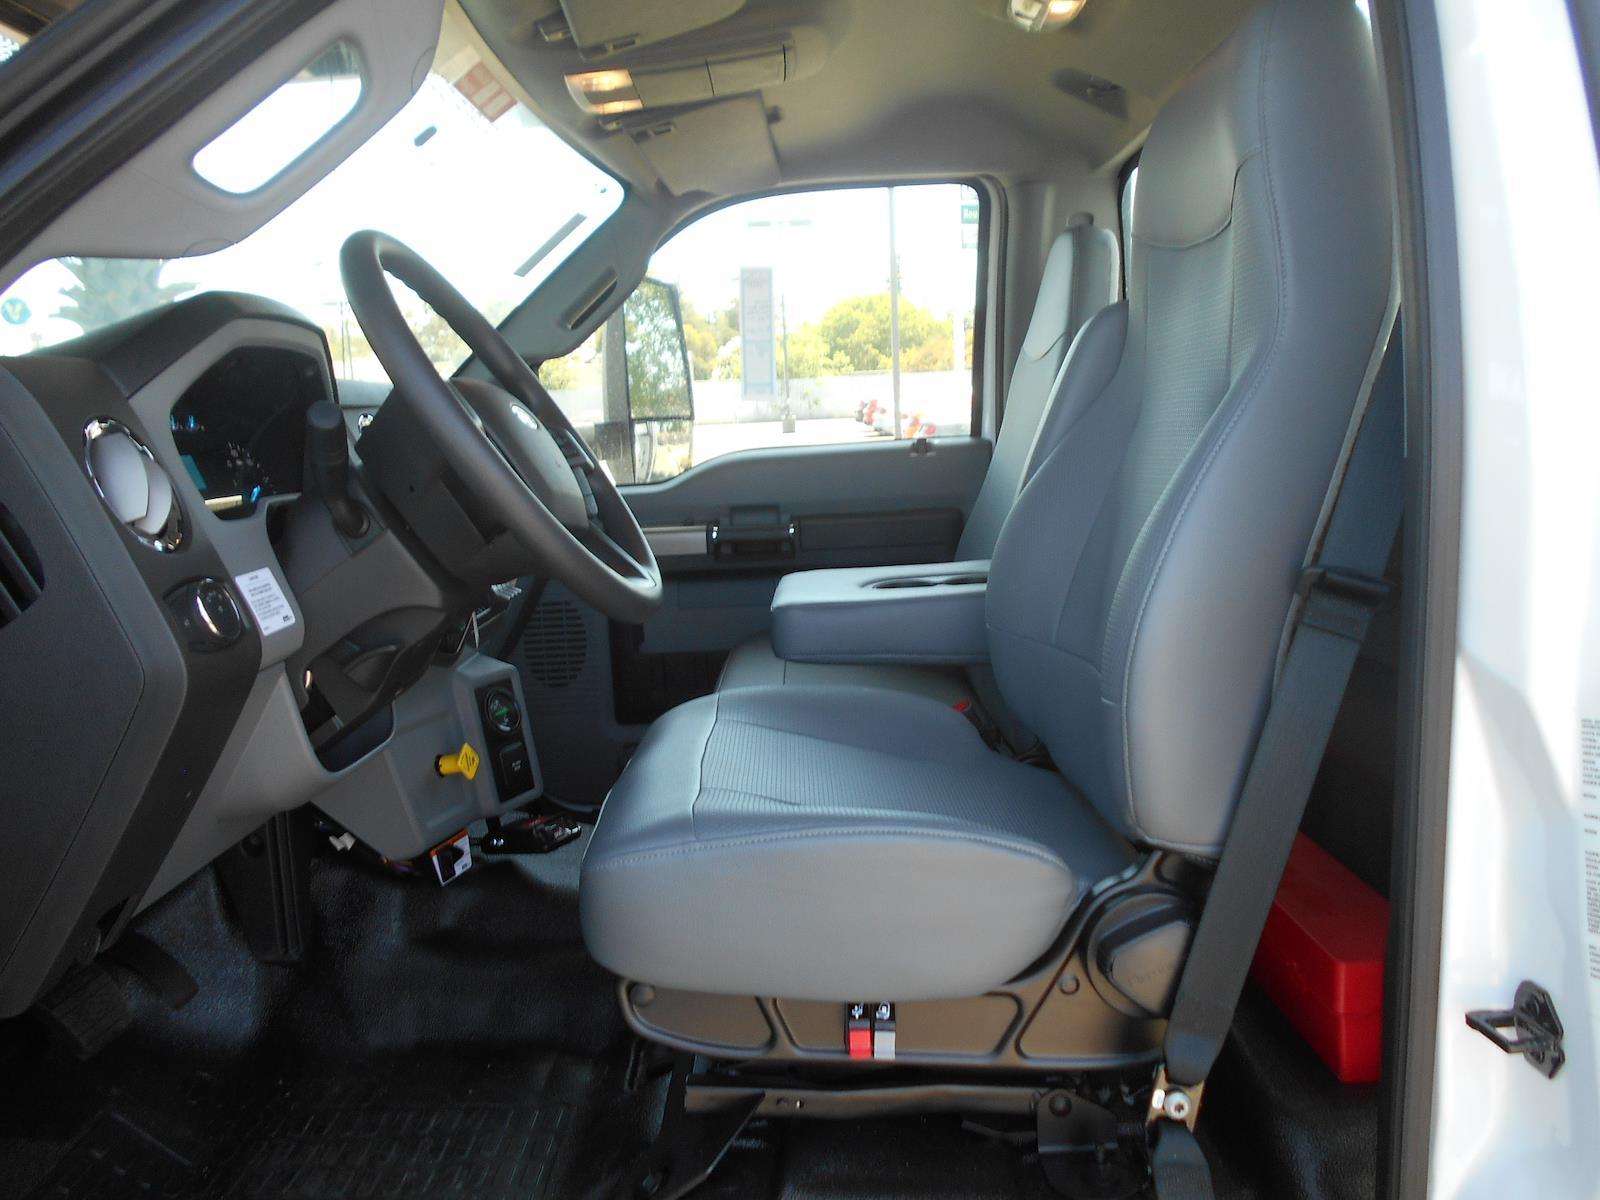 2022 Ford F-750 Regular Cab DRW 4x2, Terex Corporation Chipper Body #59957 - photo 1